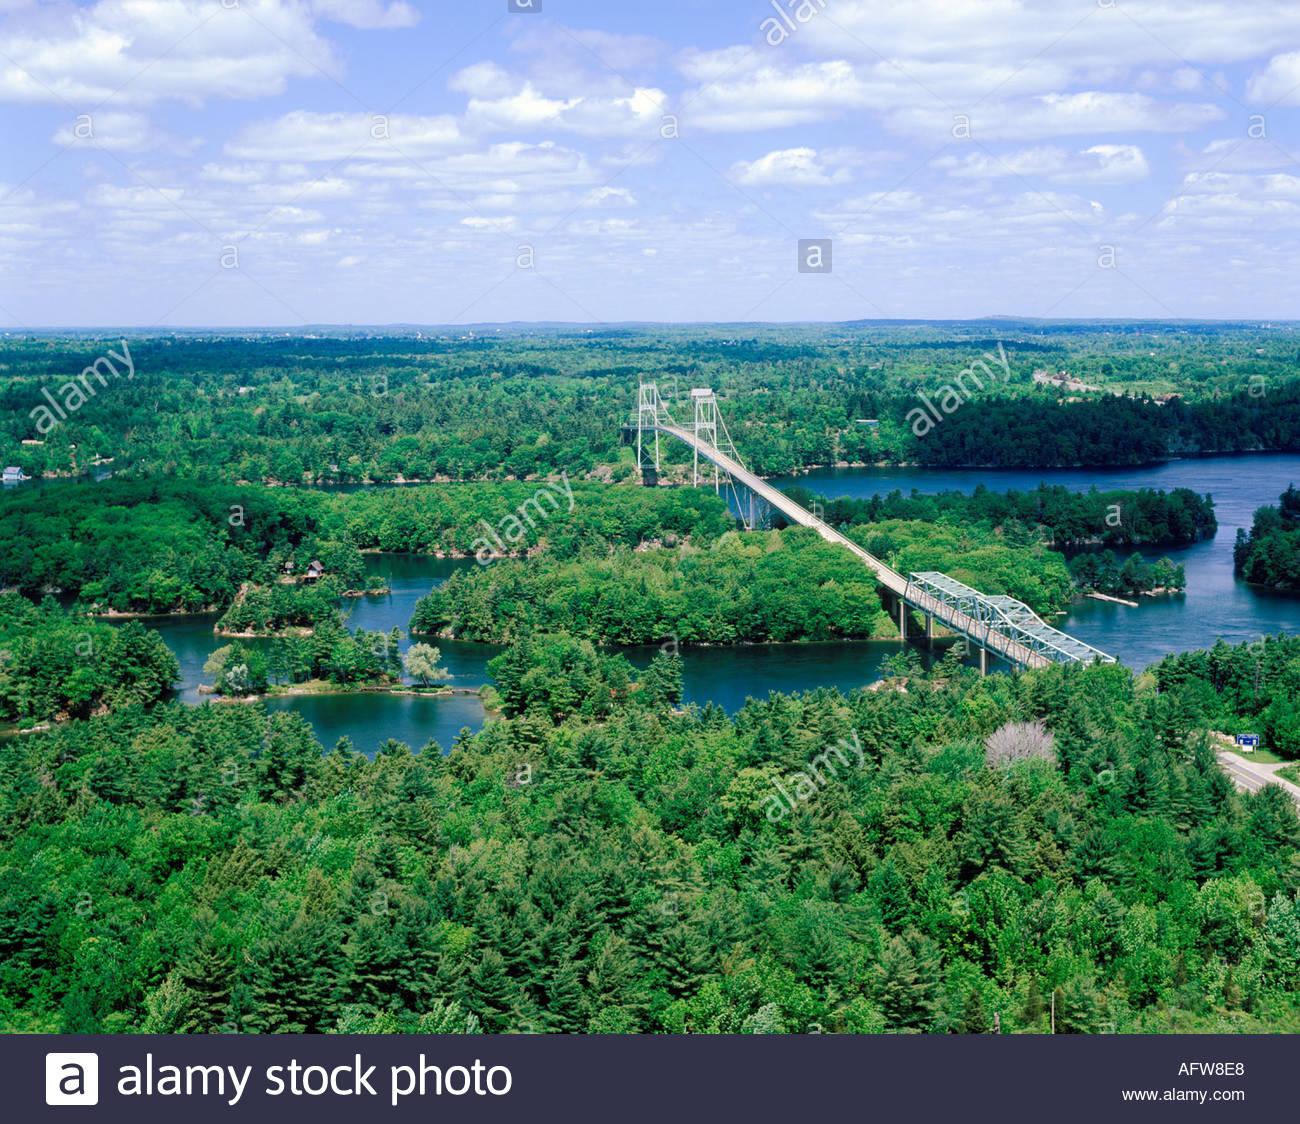 ivy-lea-bridge-in-the-thousand-islands-o